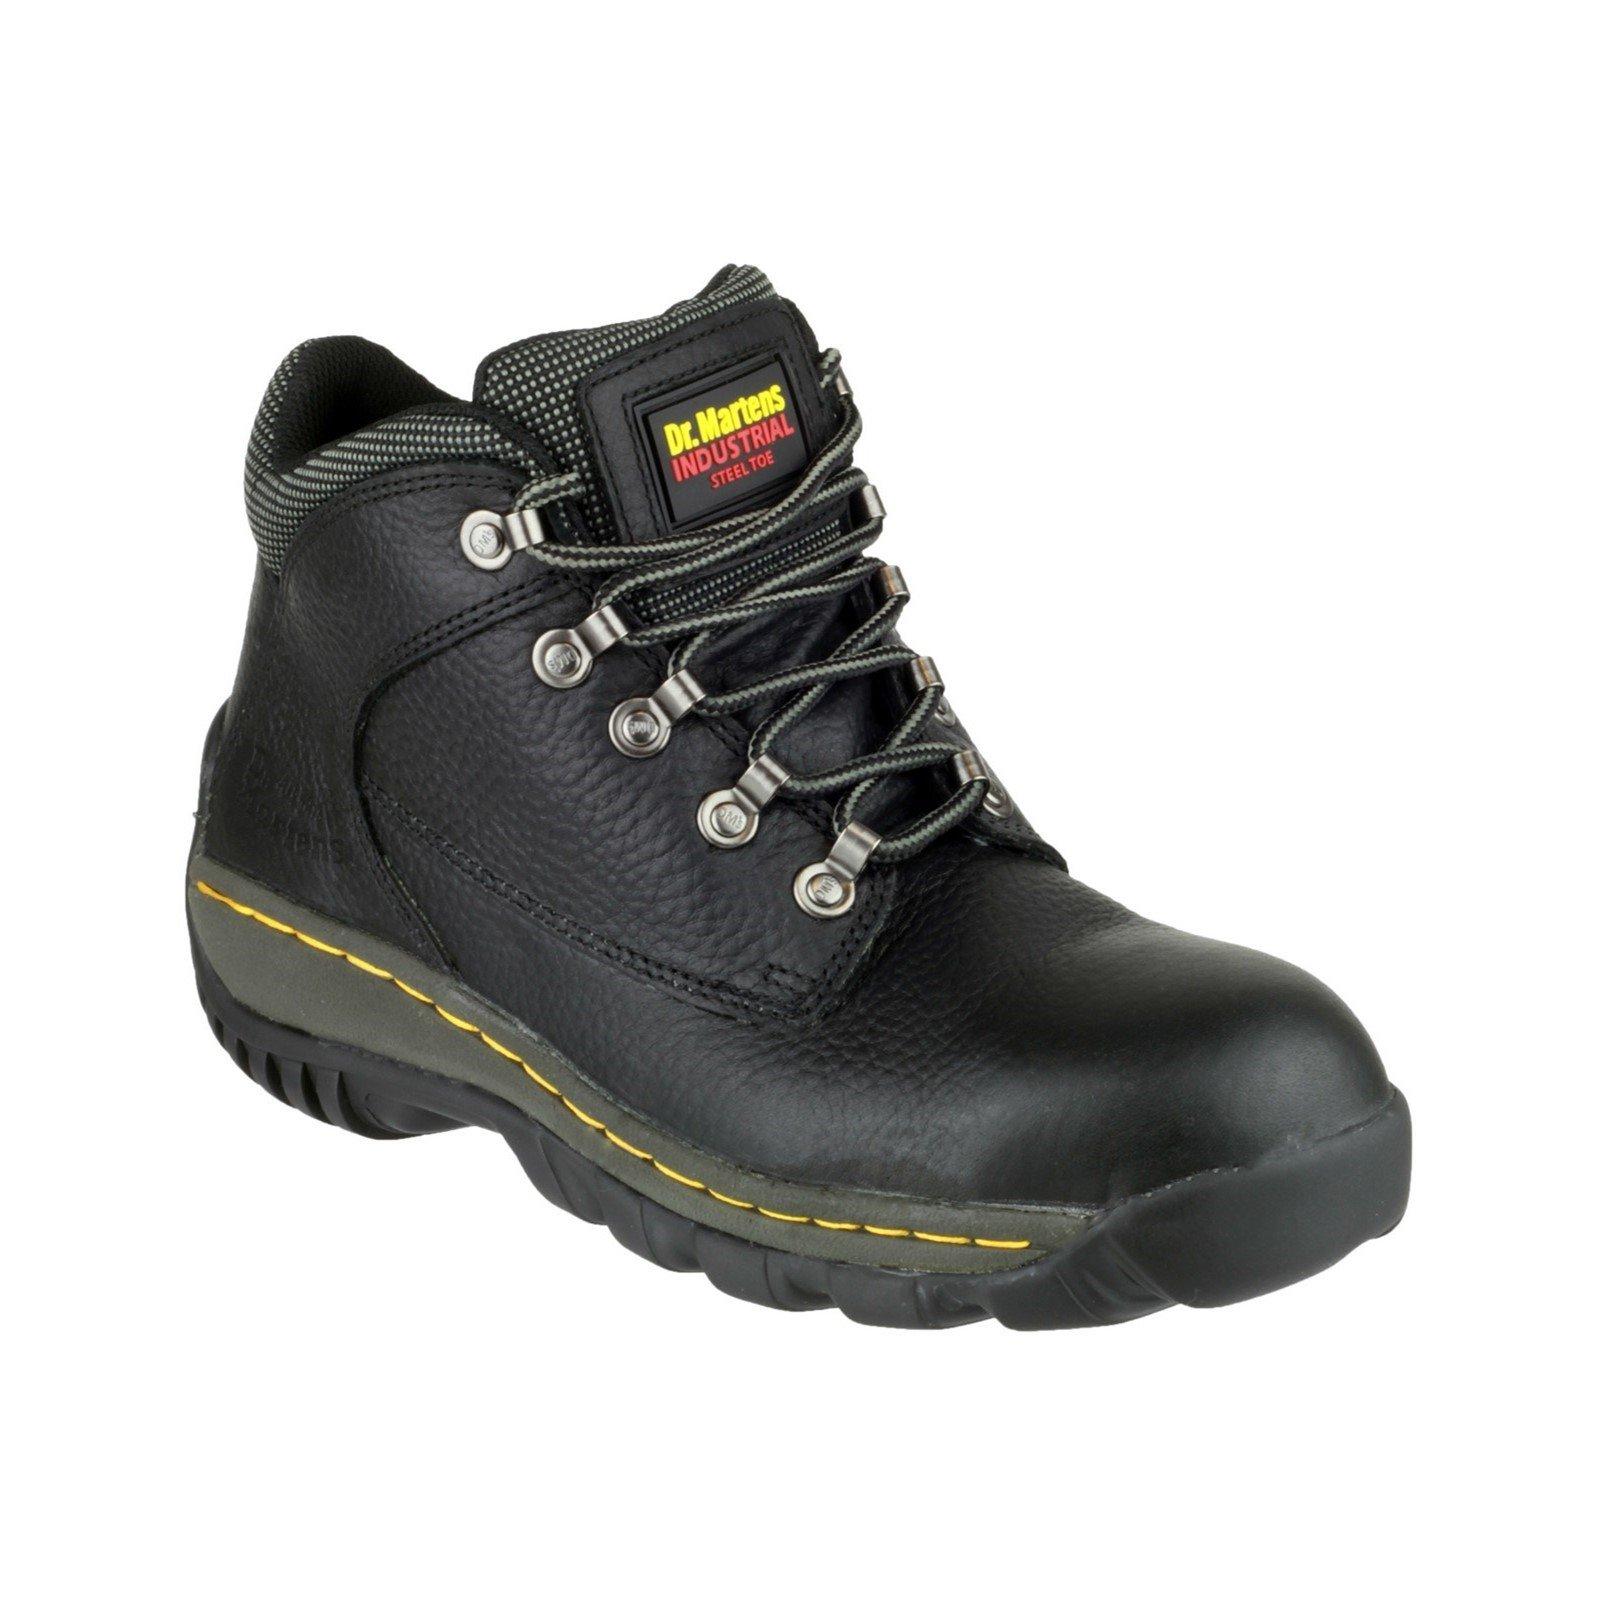 Dr Martens Unisex Lace-Up Boot Black 05207 - Black 11